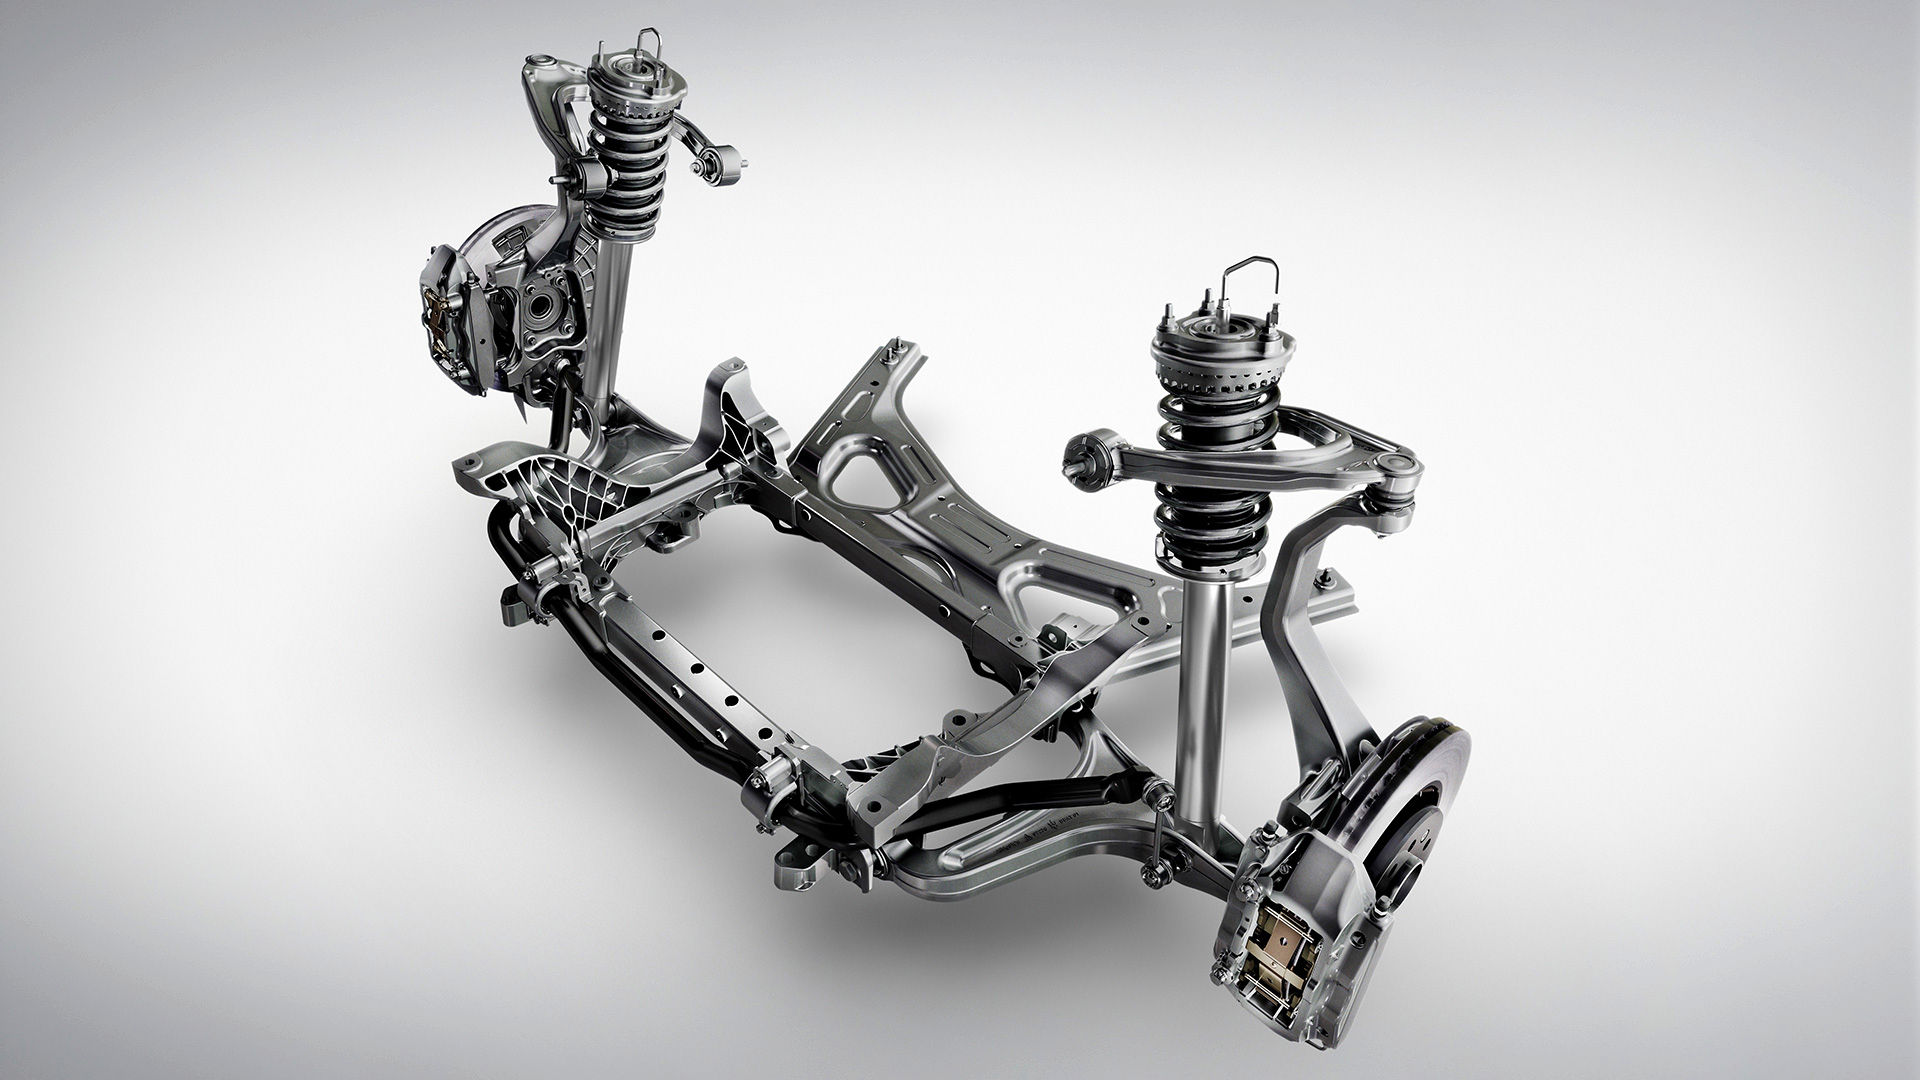 Skyhook Radaufhängung - Maserati Ghibli